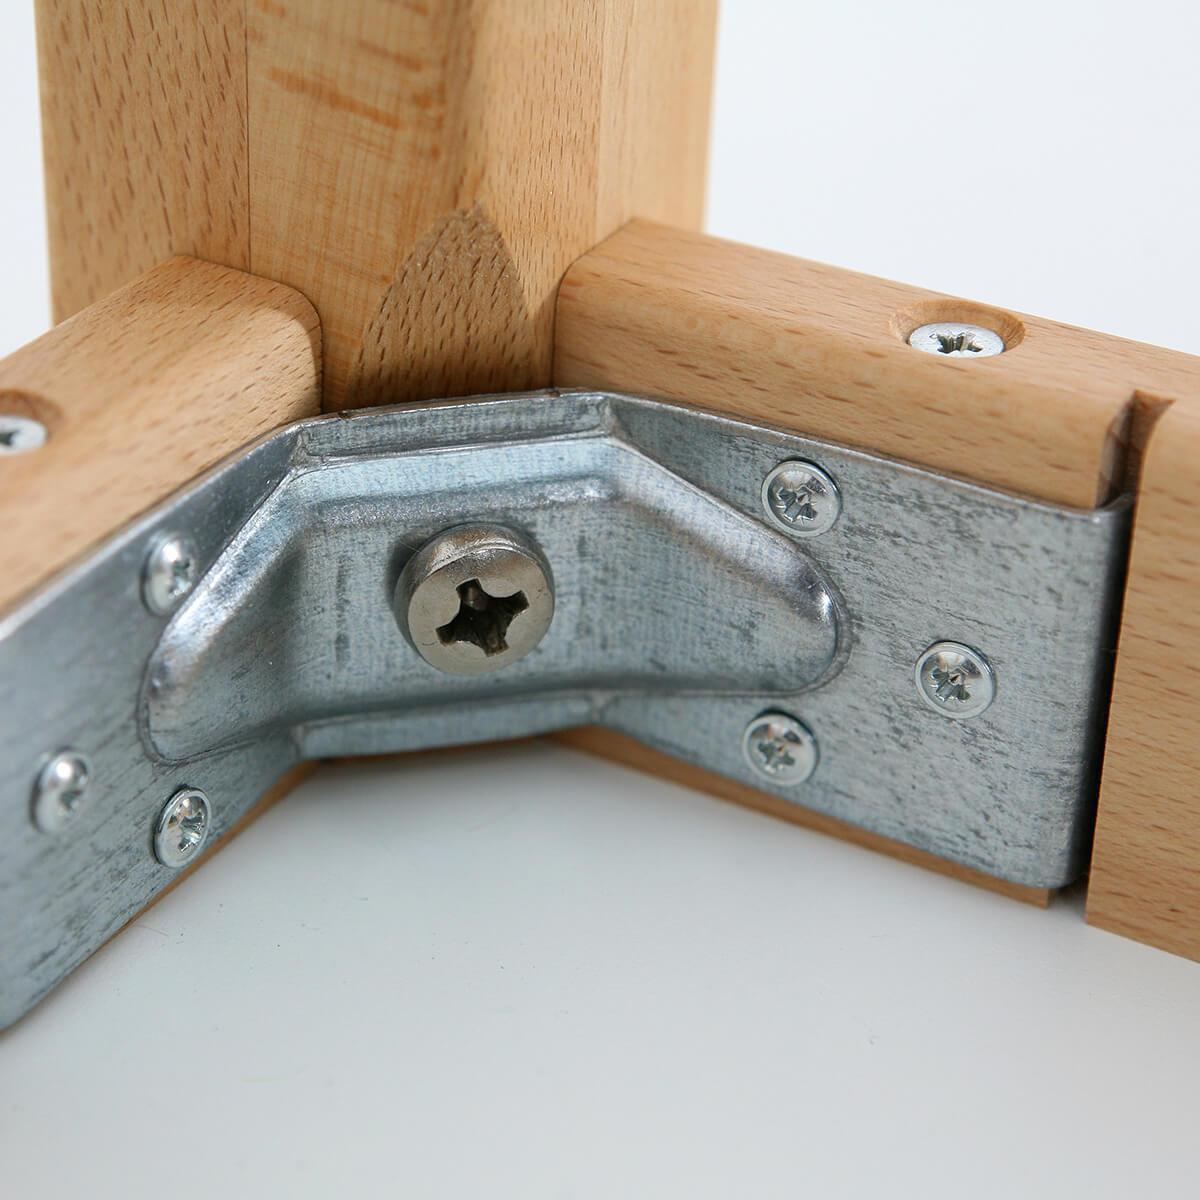 Kindertisch 60x60 - H 40/50 DECOR Debreuyn -  Birke Multiplex weiß HPL beschichtet